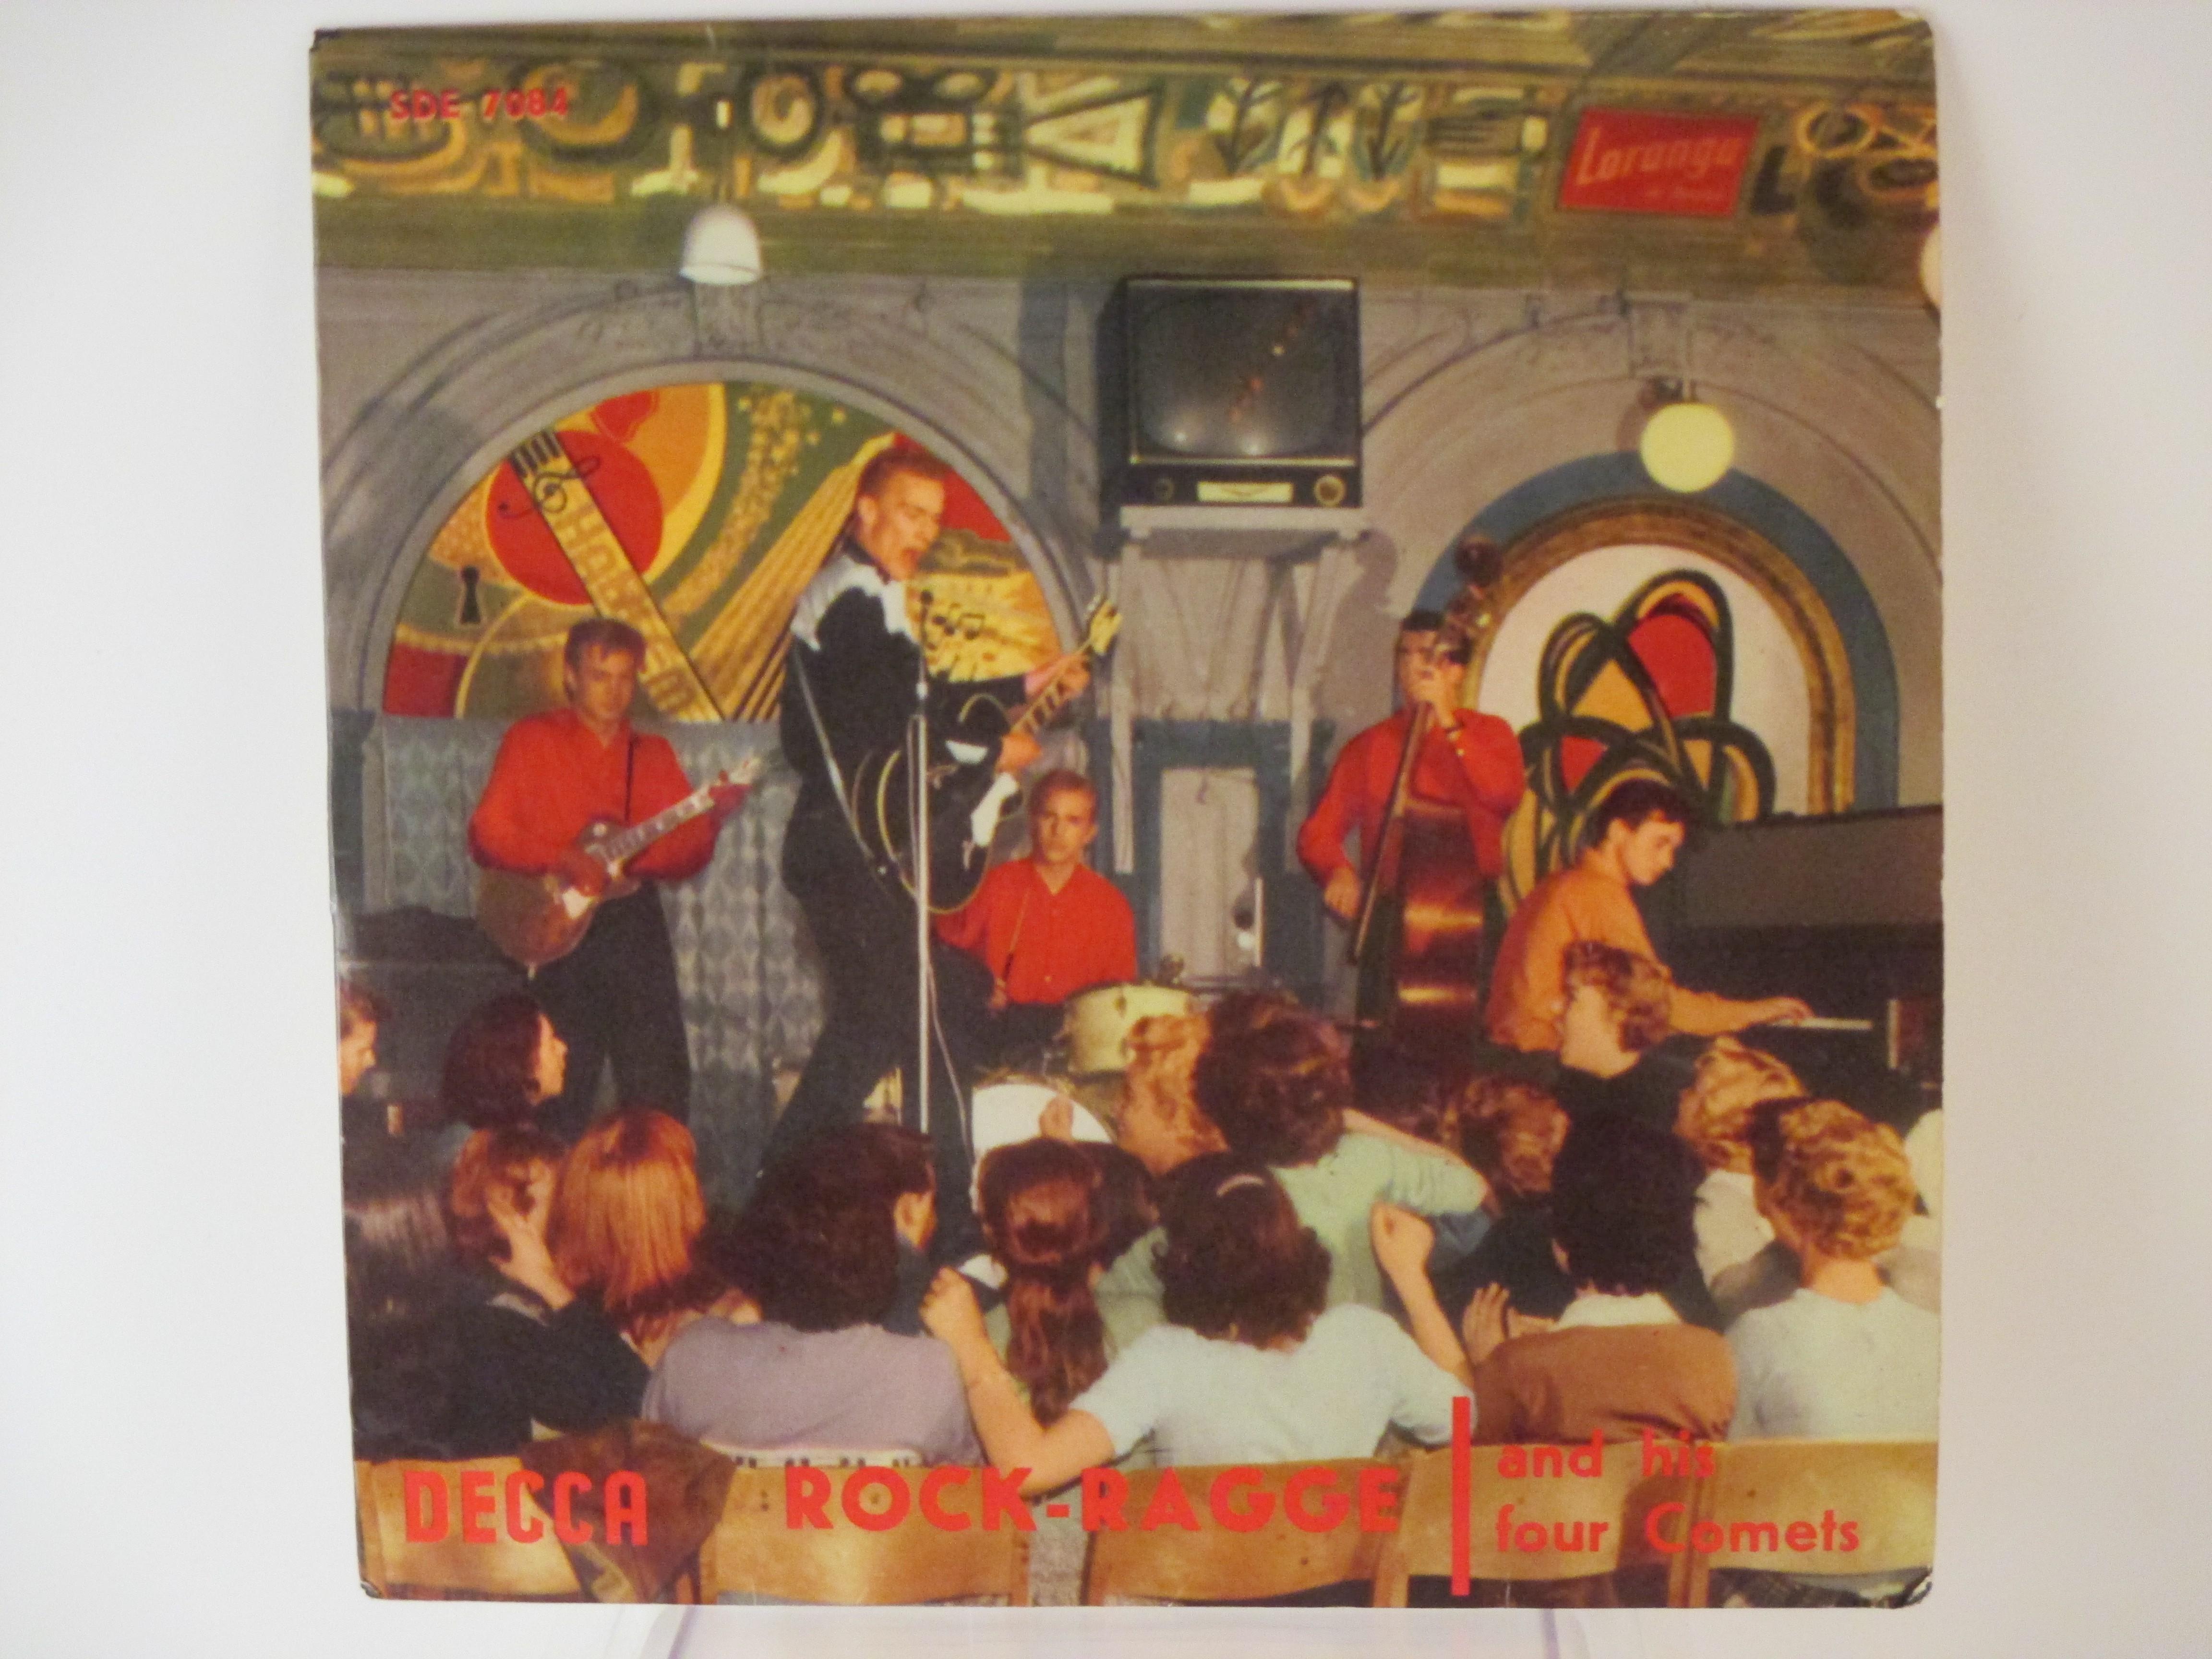 ROCK-RAGGE : (EP) Teach you to rock / Be-bop-a-lula / Bluejean bop / Ball-room baby